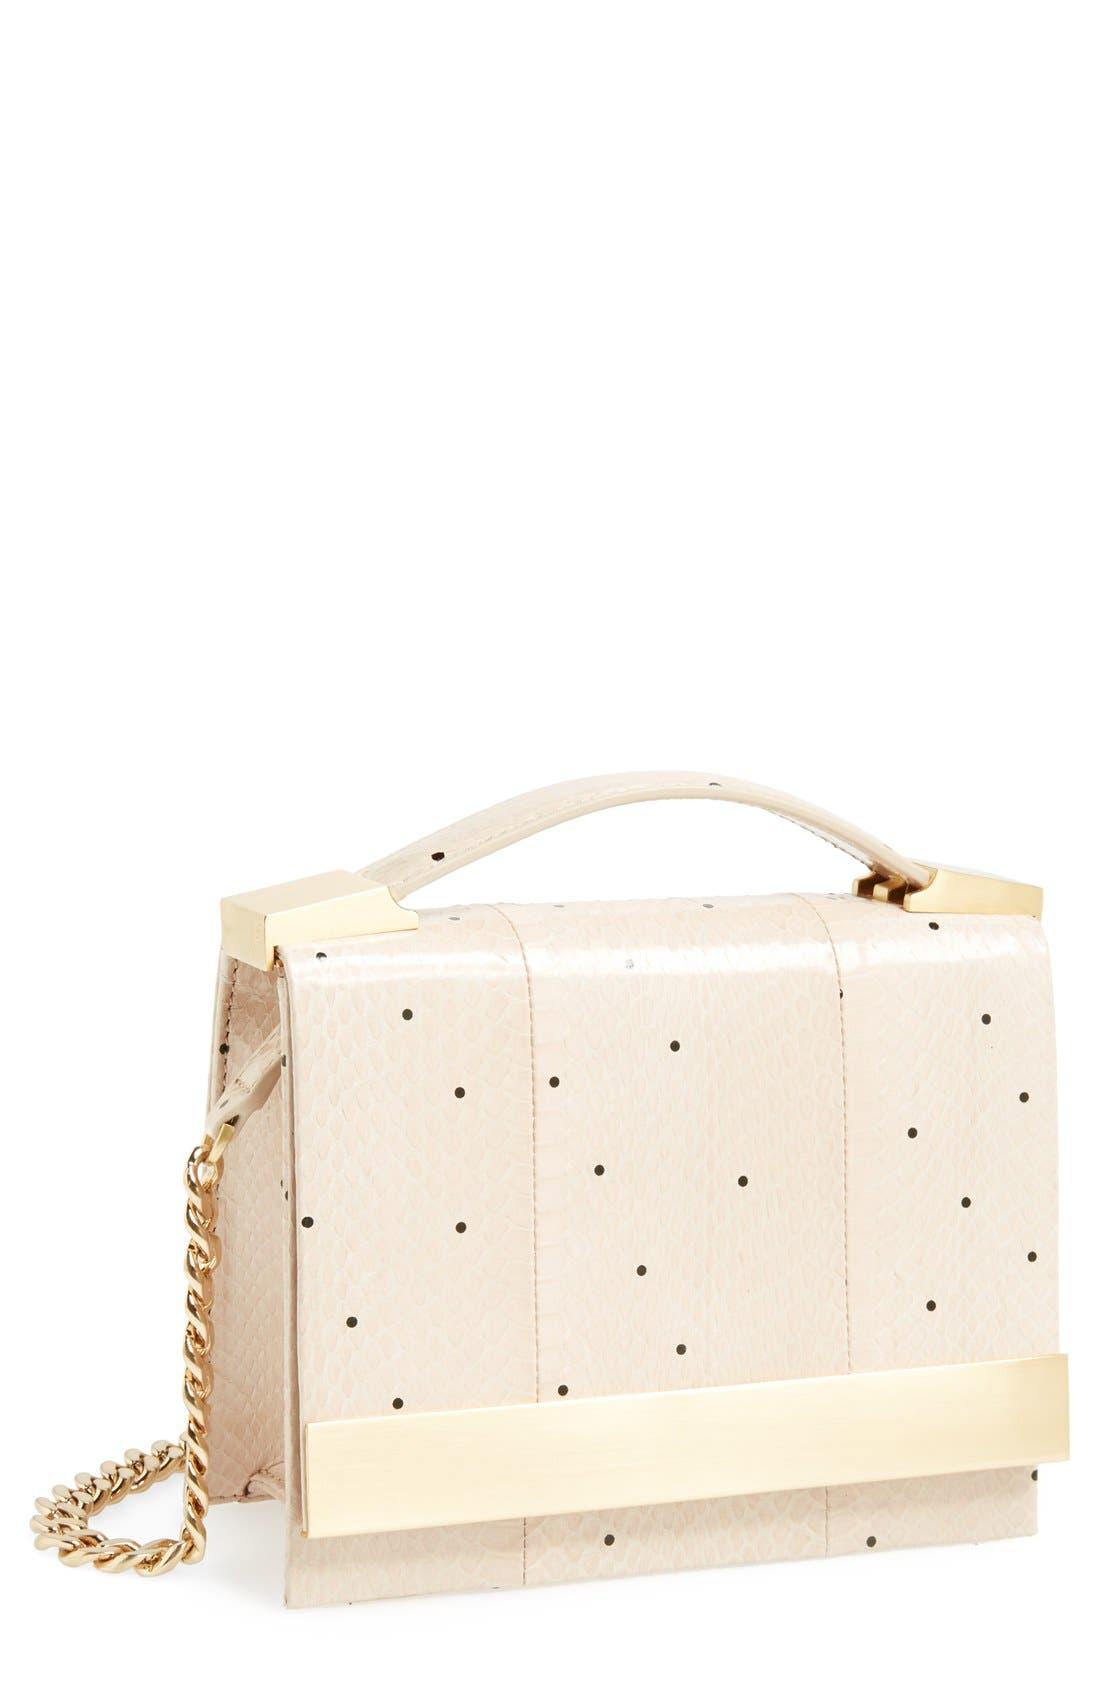 Alternate Image 1 Selected - B Brian Atwood 'Ava' Crossbody Bag